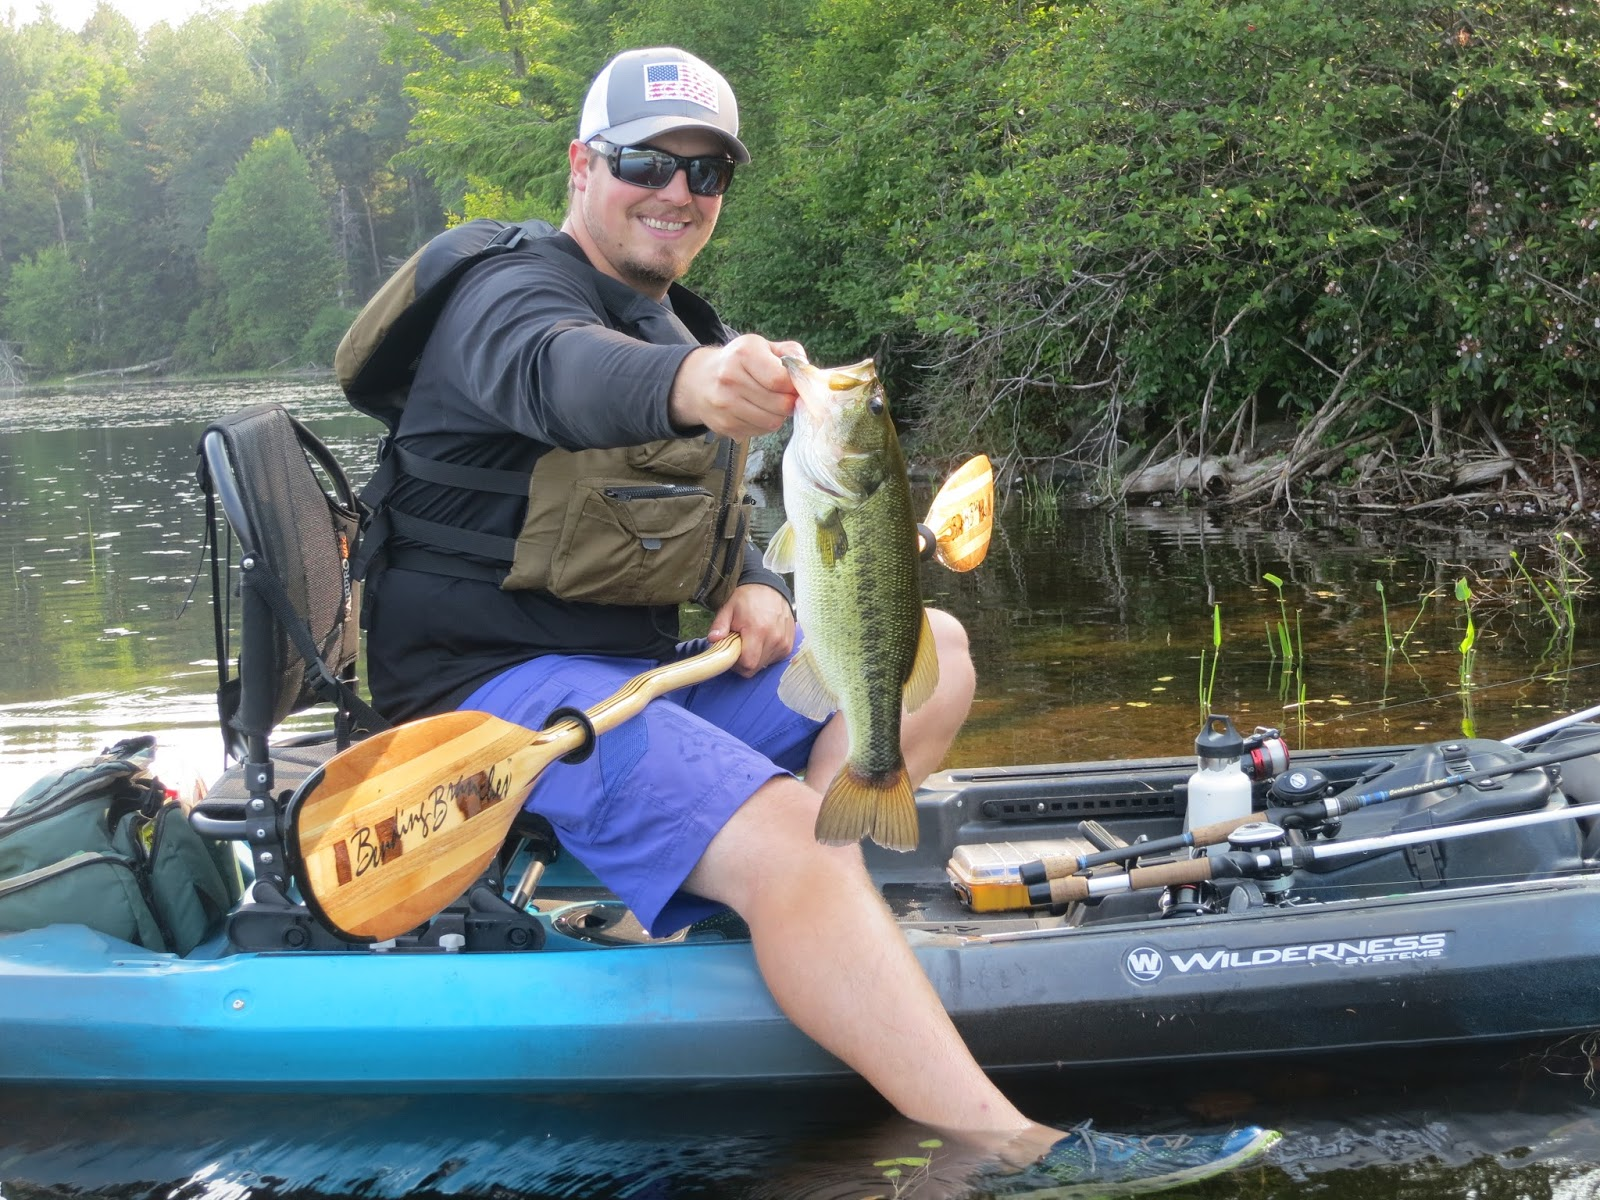 Photo credit:  www.manpoweredfishing.com